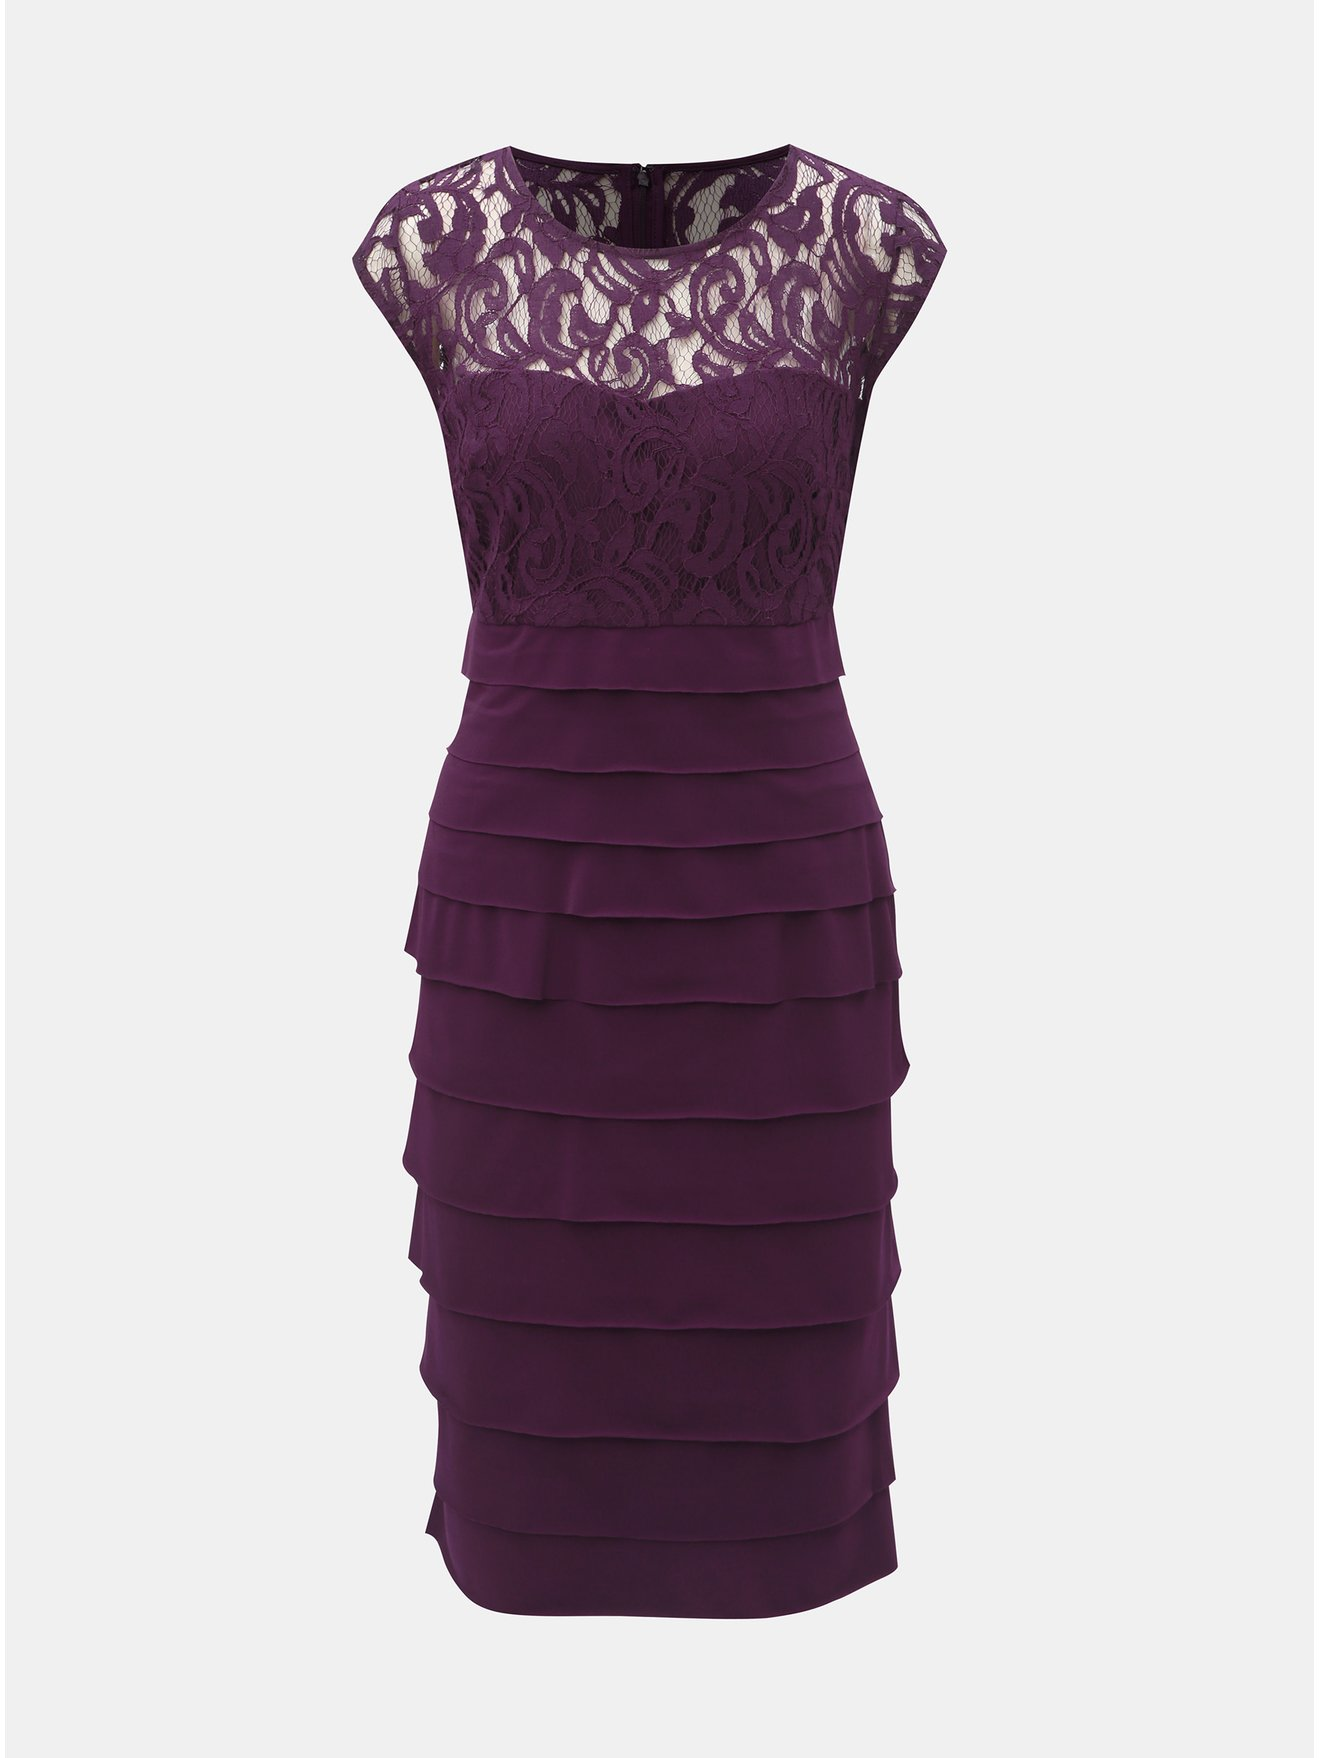 Fialové šaty s krajkovým detailem Lily & Franc by Dorothy Perkins